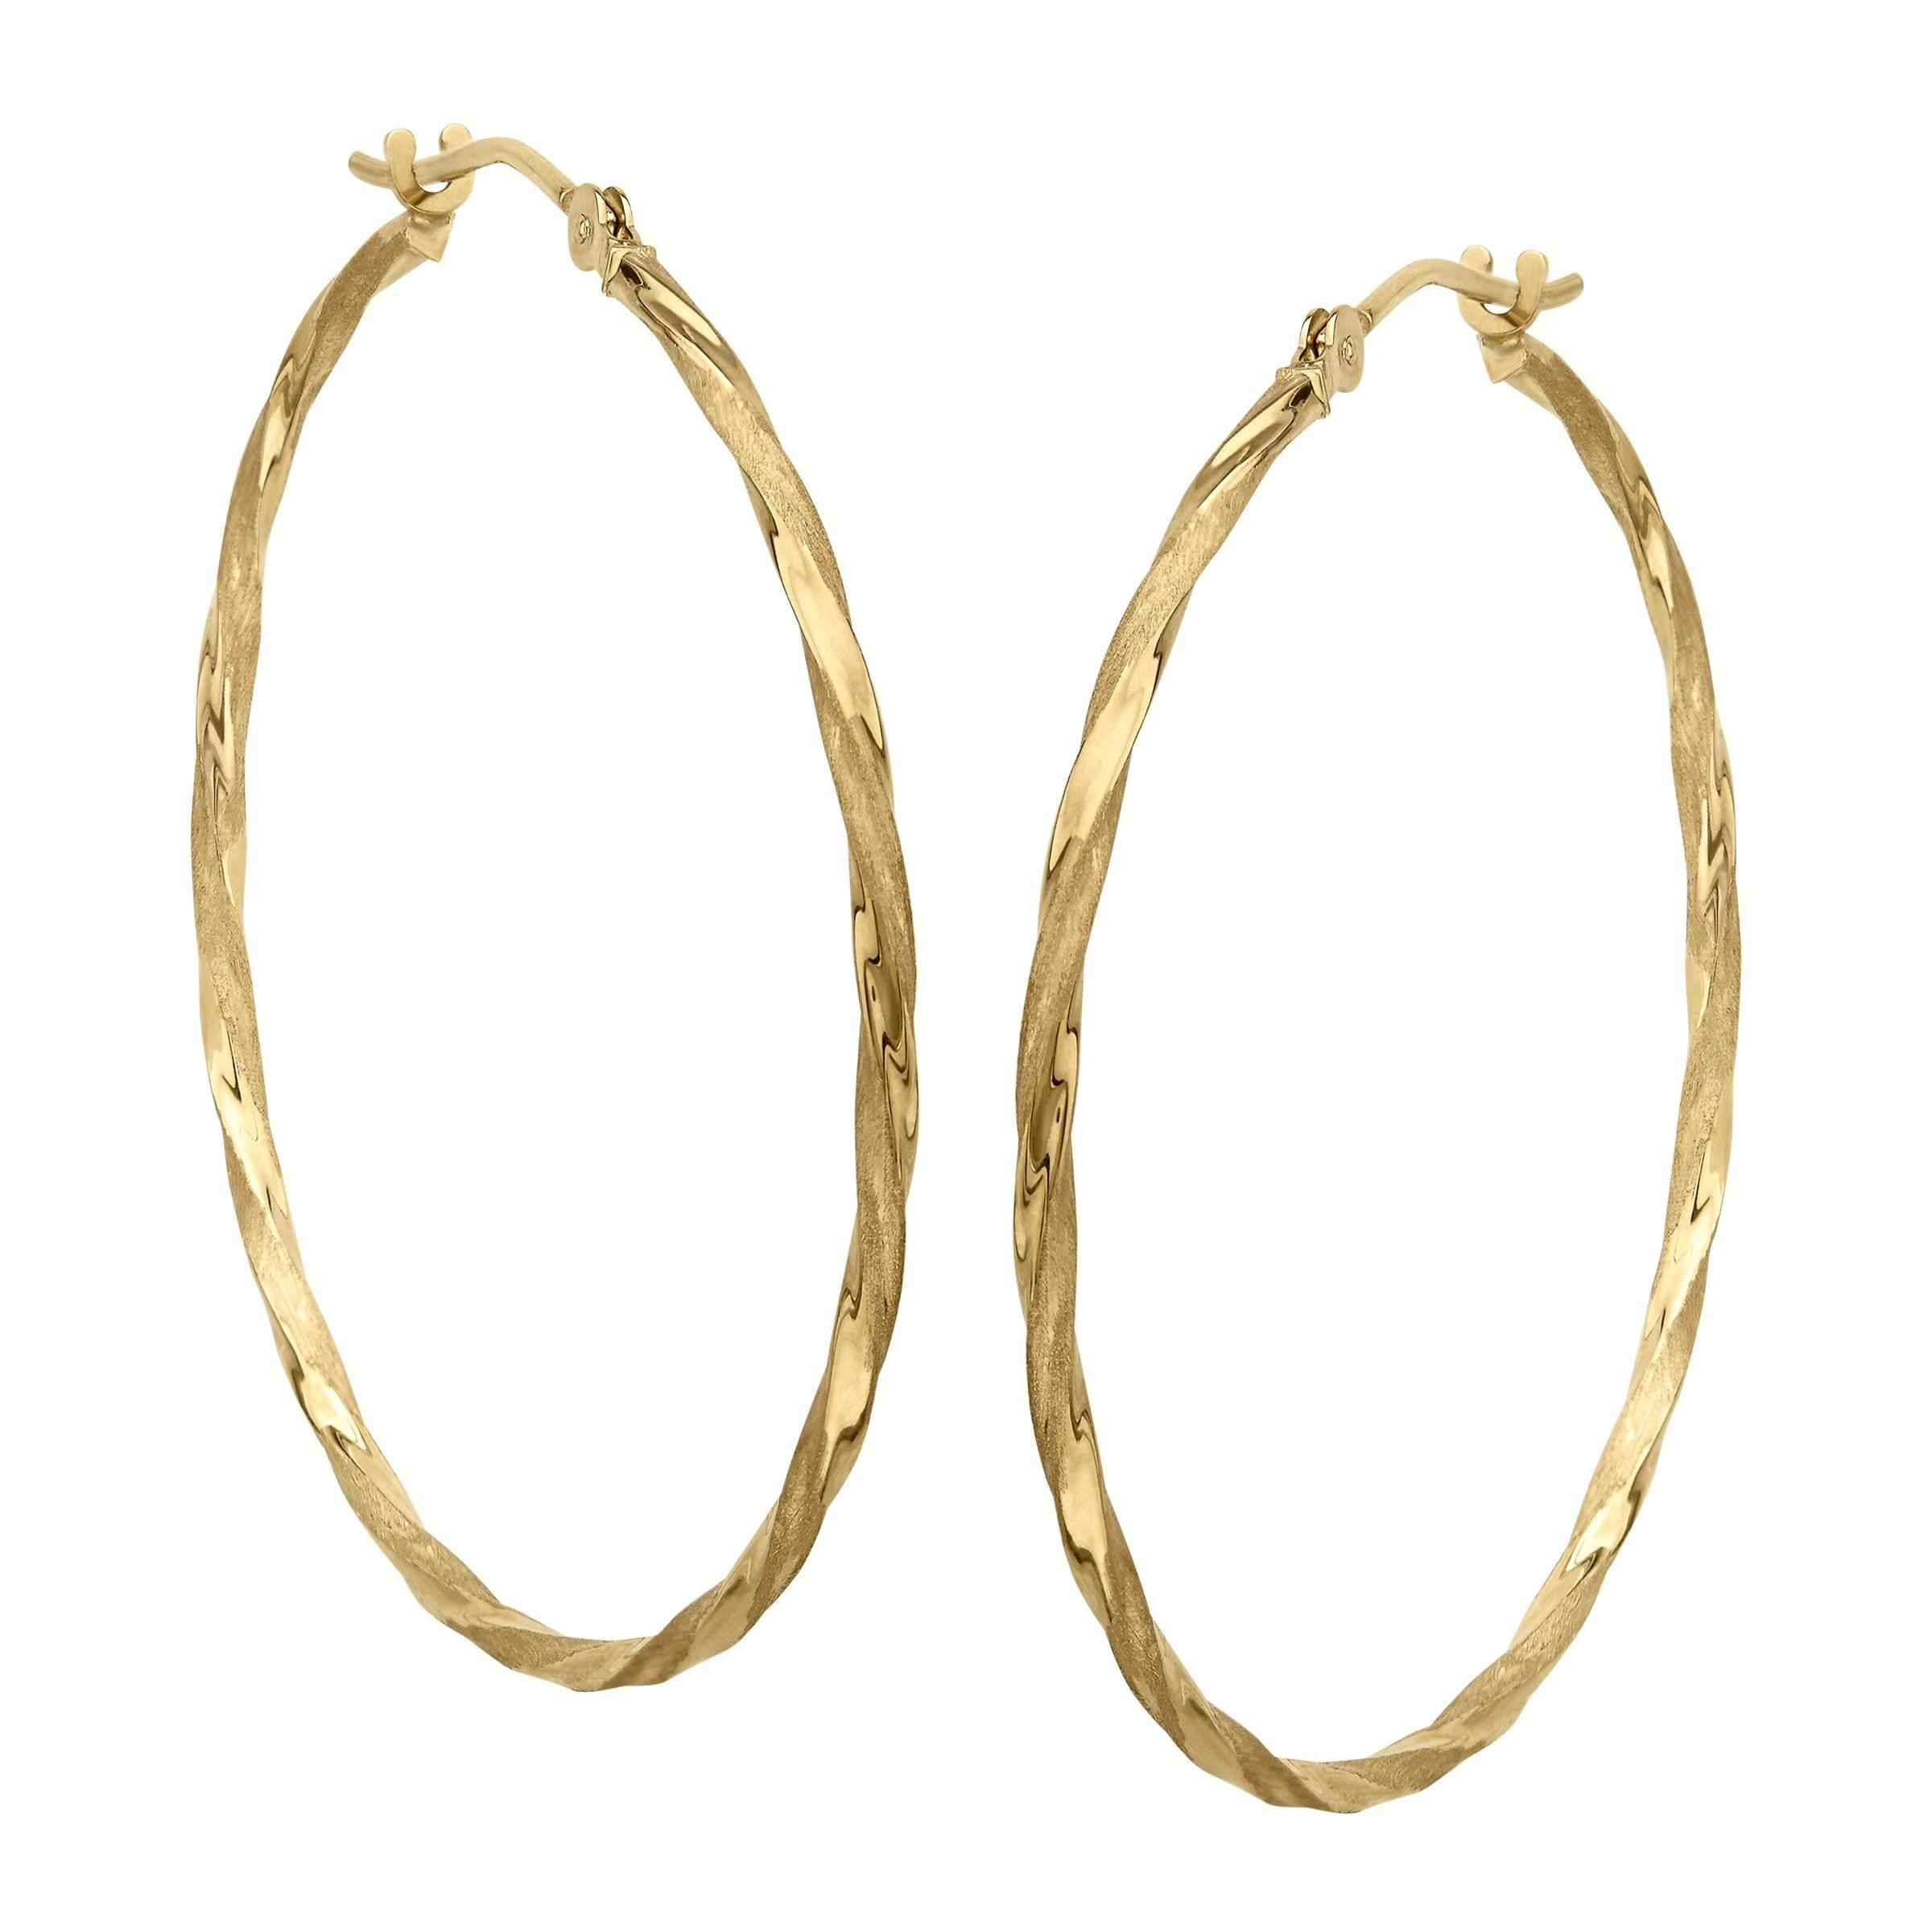 Shop Eternity Gold Twisted Hoop Earrings In 14k Gold Yellow On